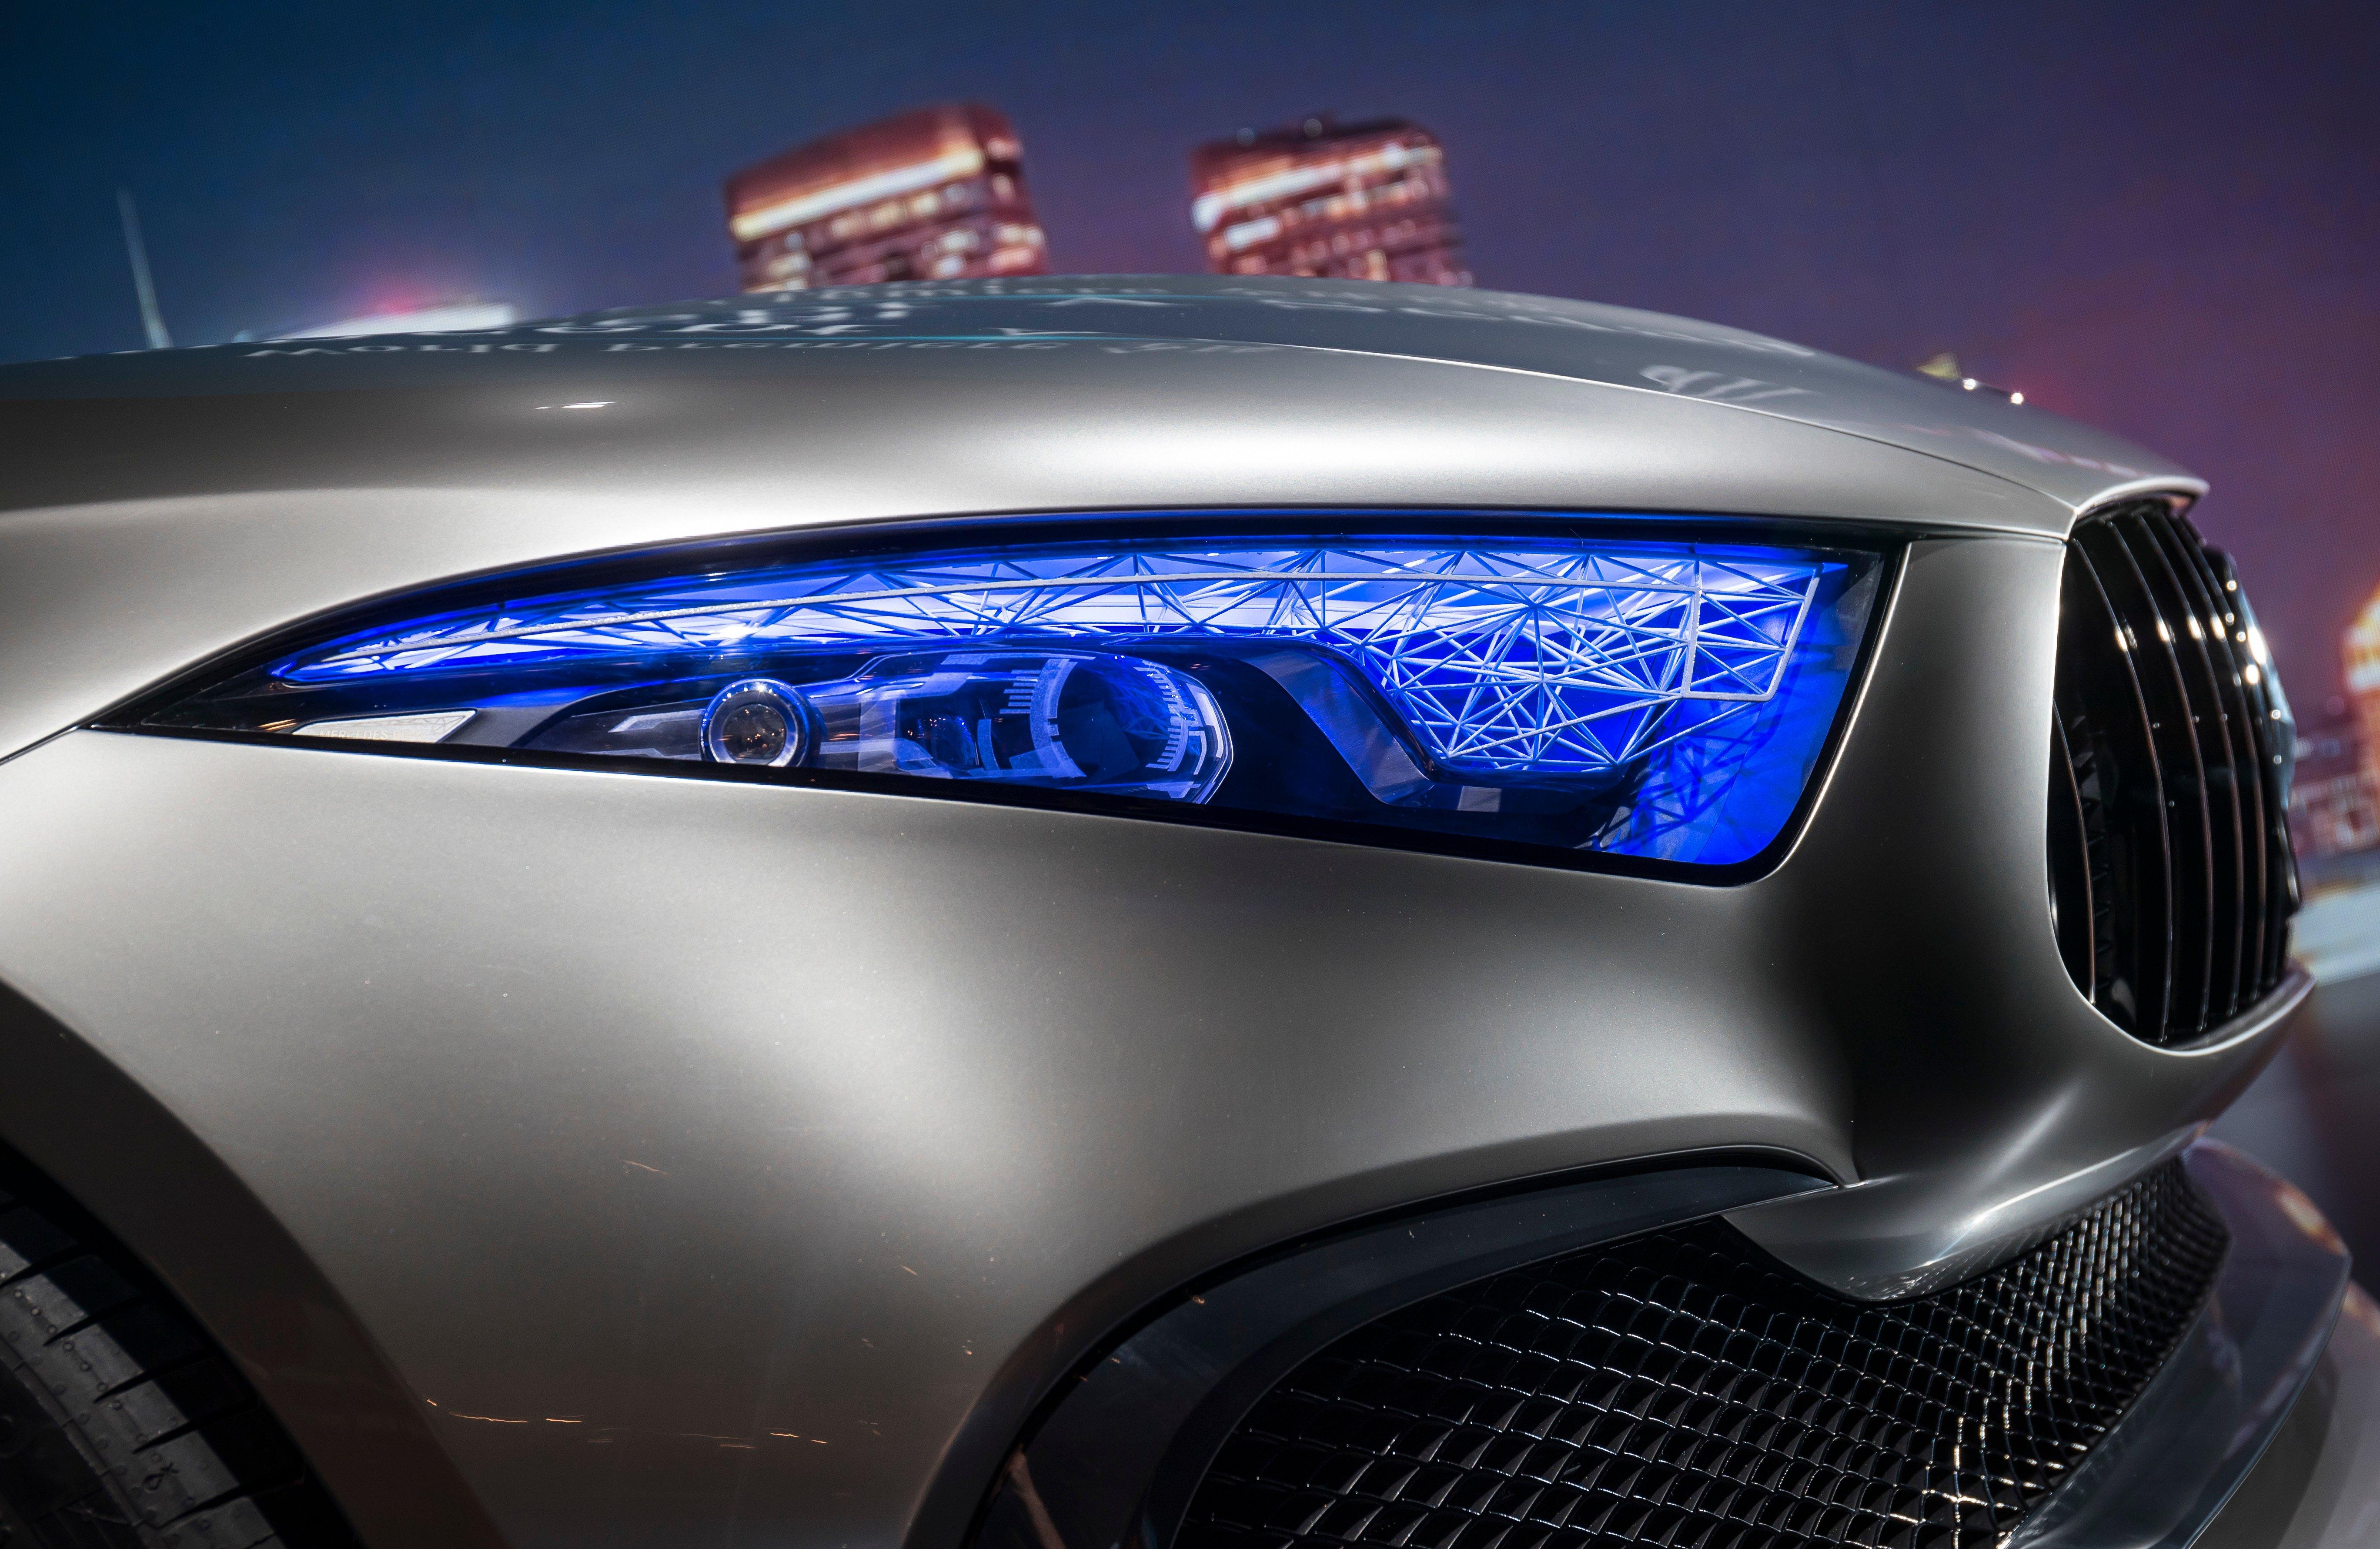 https://s2.paultan.org/image/2017/04/Mercedes-Benz-Concept-A-Sedan-live-5.jpg